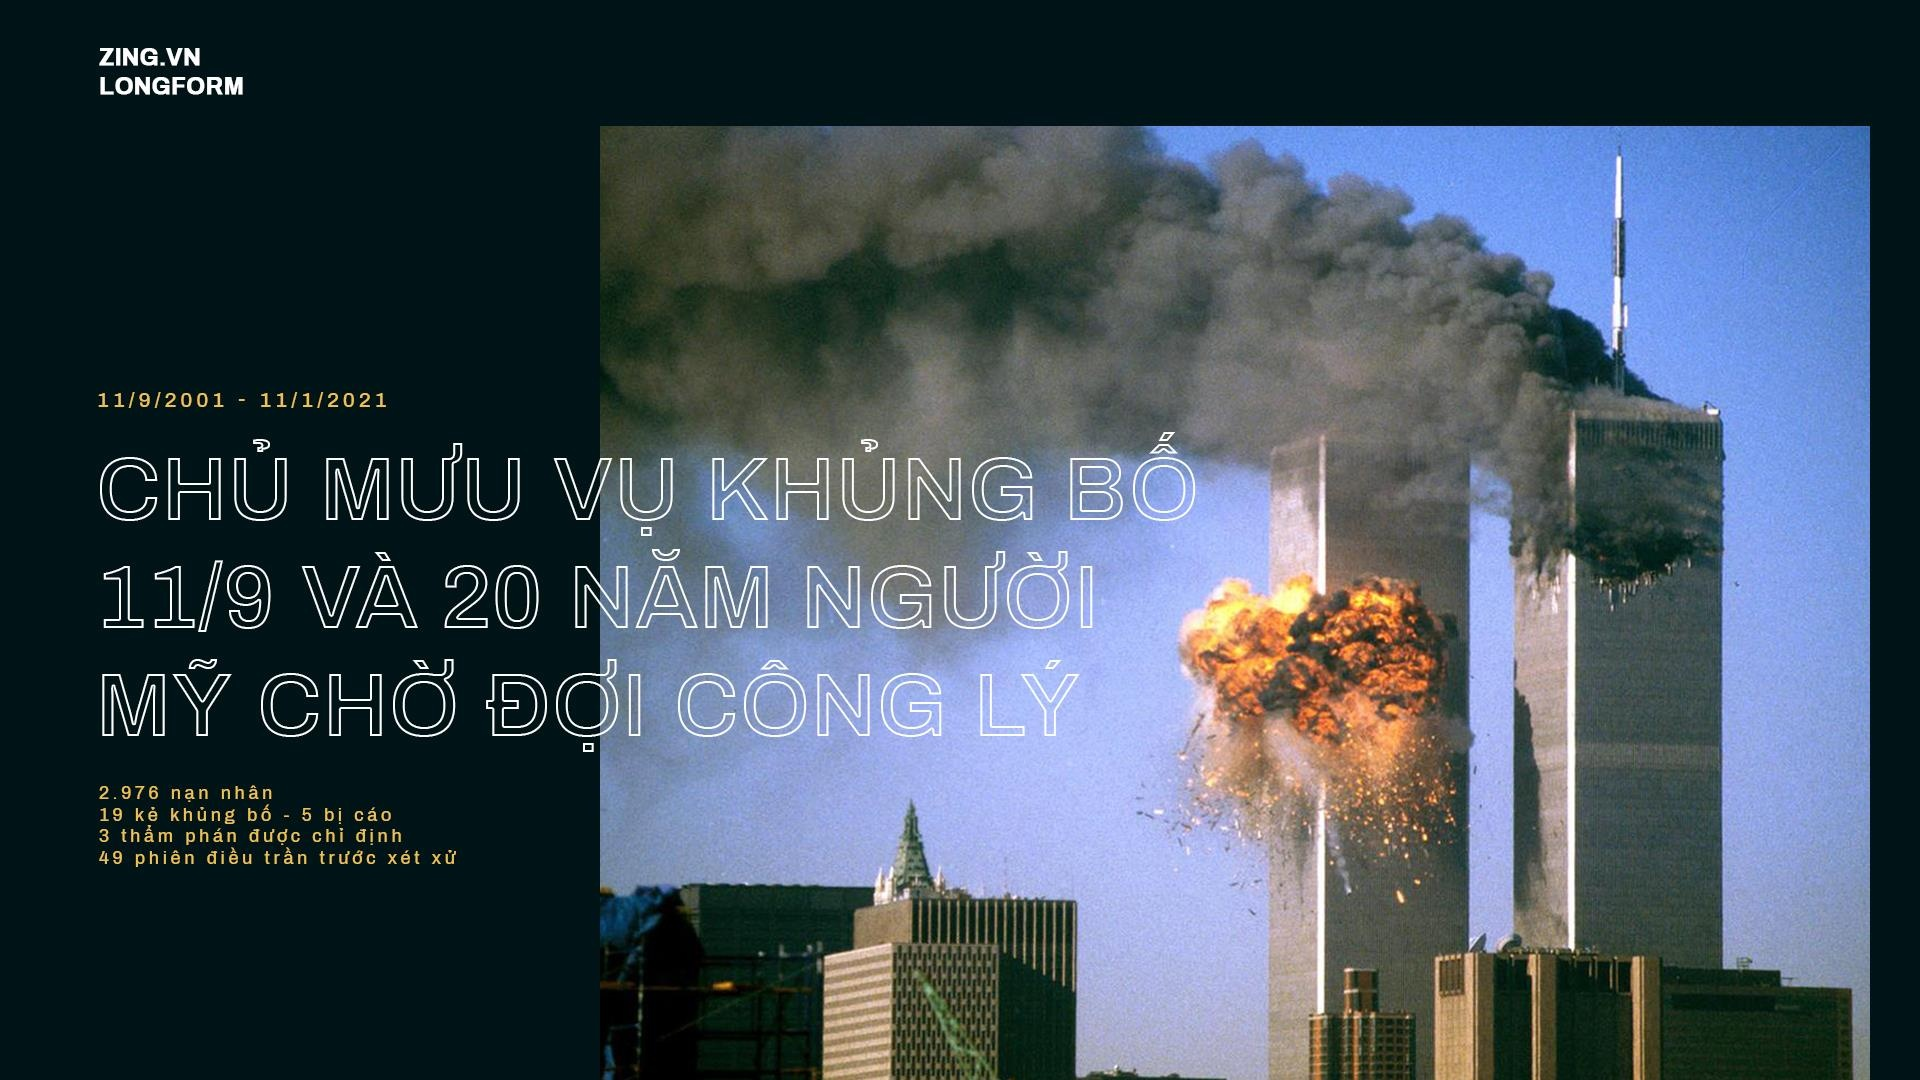 Chu muu vu khung bo 11/9 va 20 nam cho doi cong ly cua nguoi My hinh anh 2